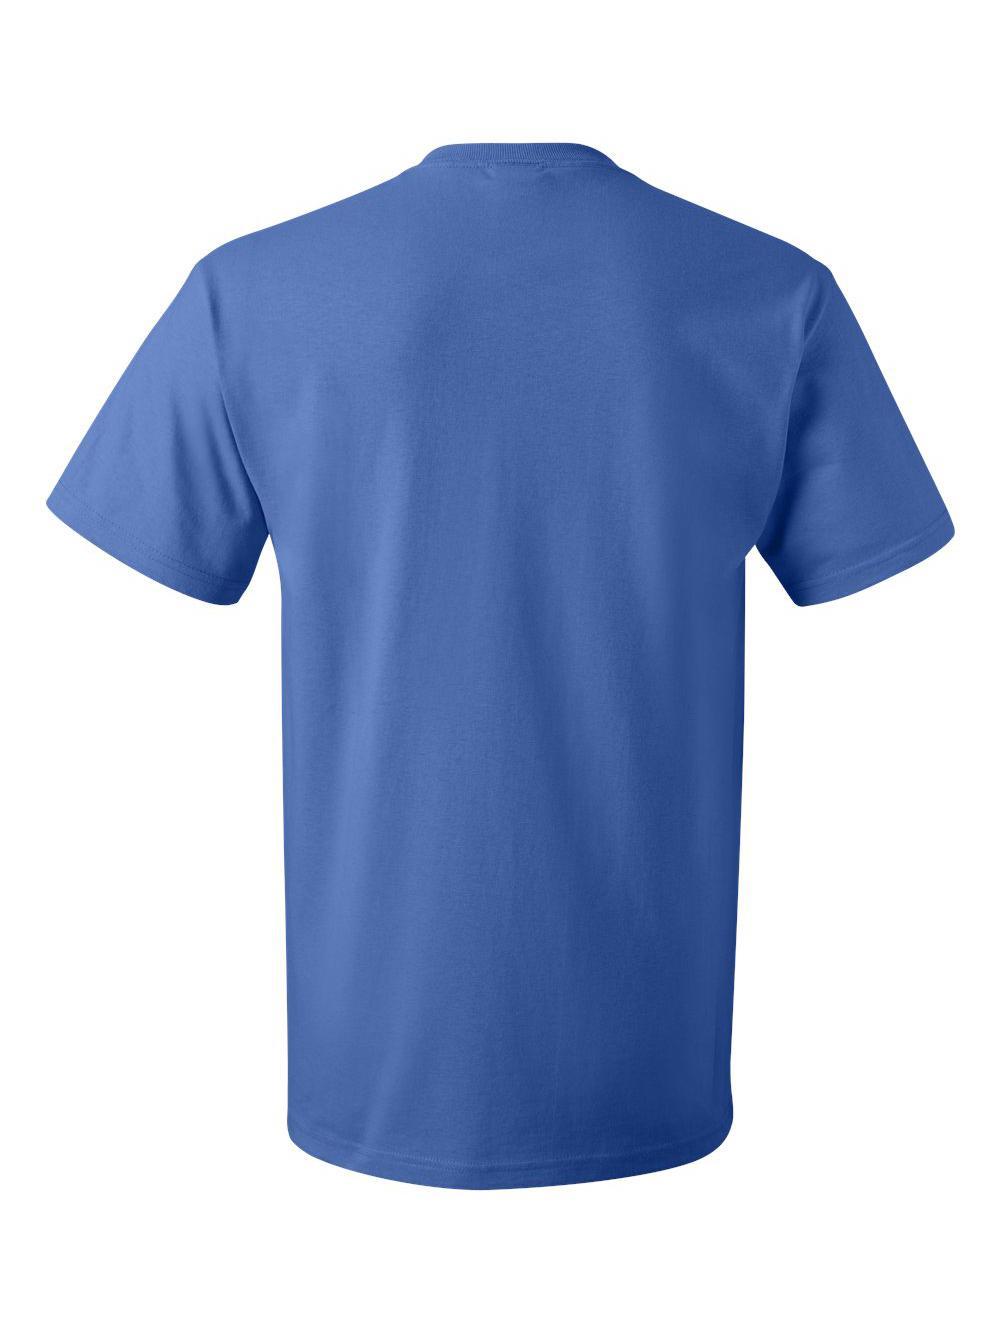 Fruit-of-the-Loom-HD-Cotton-Short-Sleeve-T-Shirt-3930R thumbnail 112